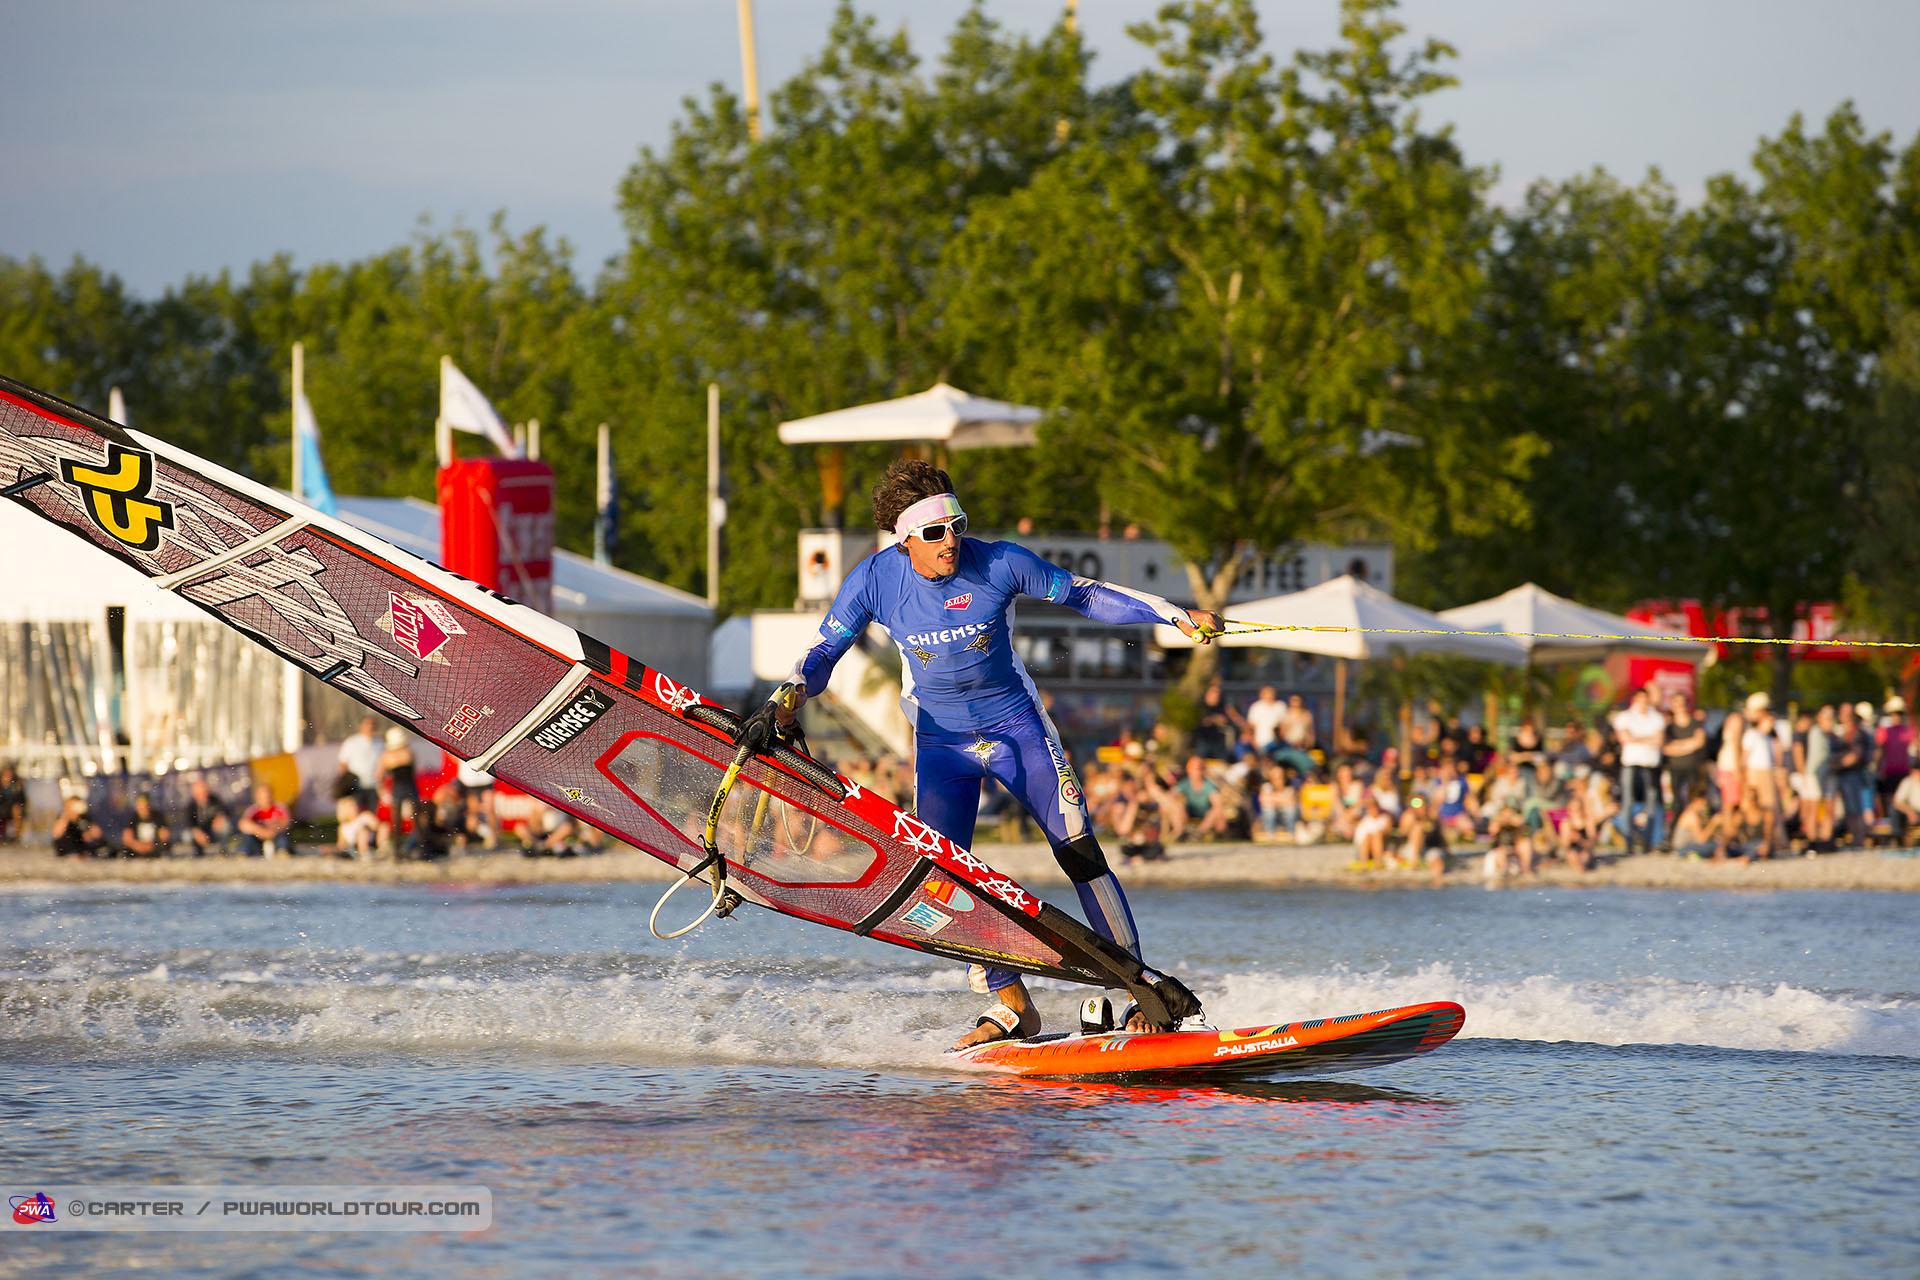 Pwa World Windsurfing Tour Surf World Cup Podersdorf 2016